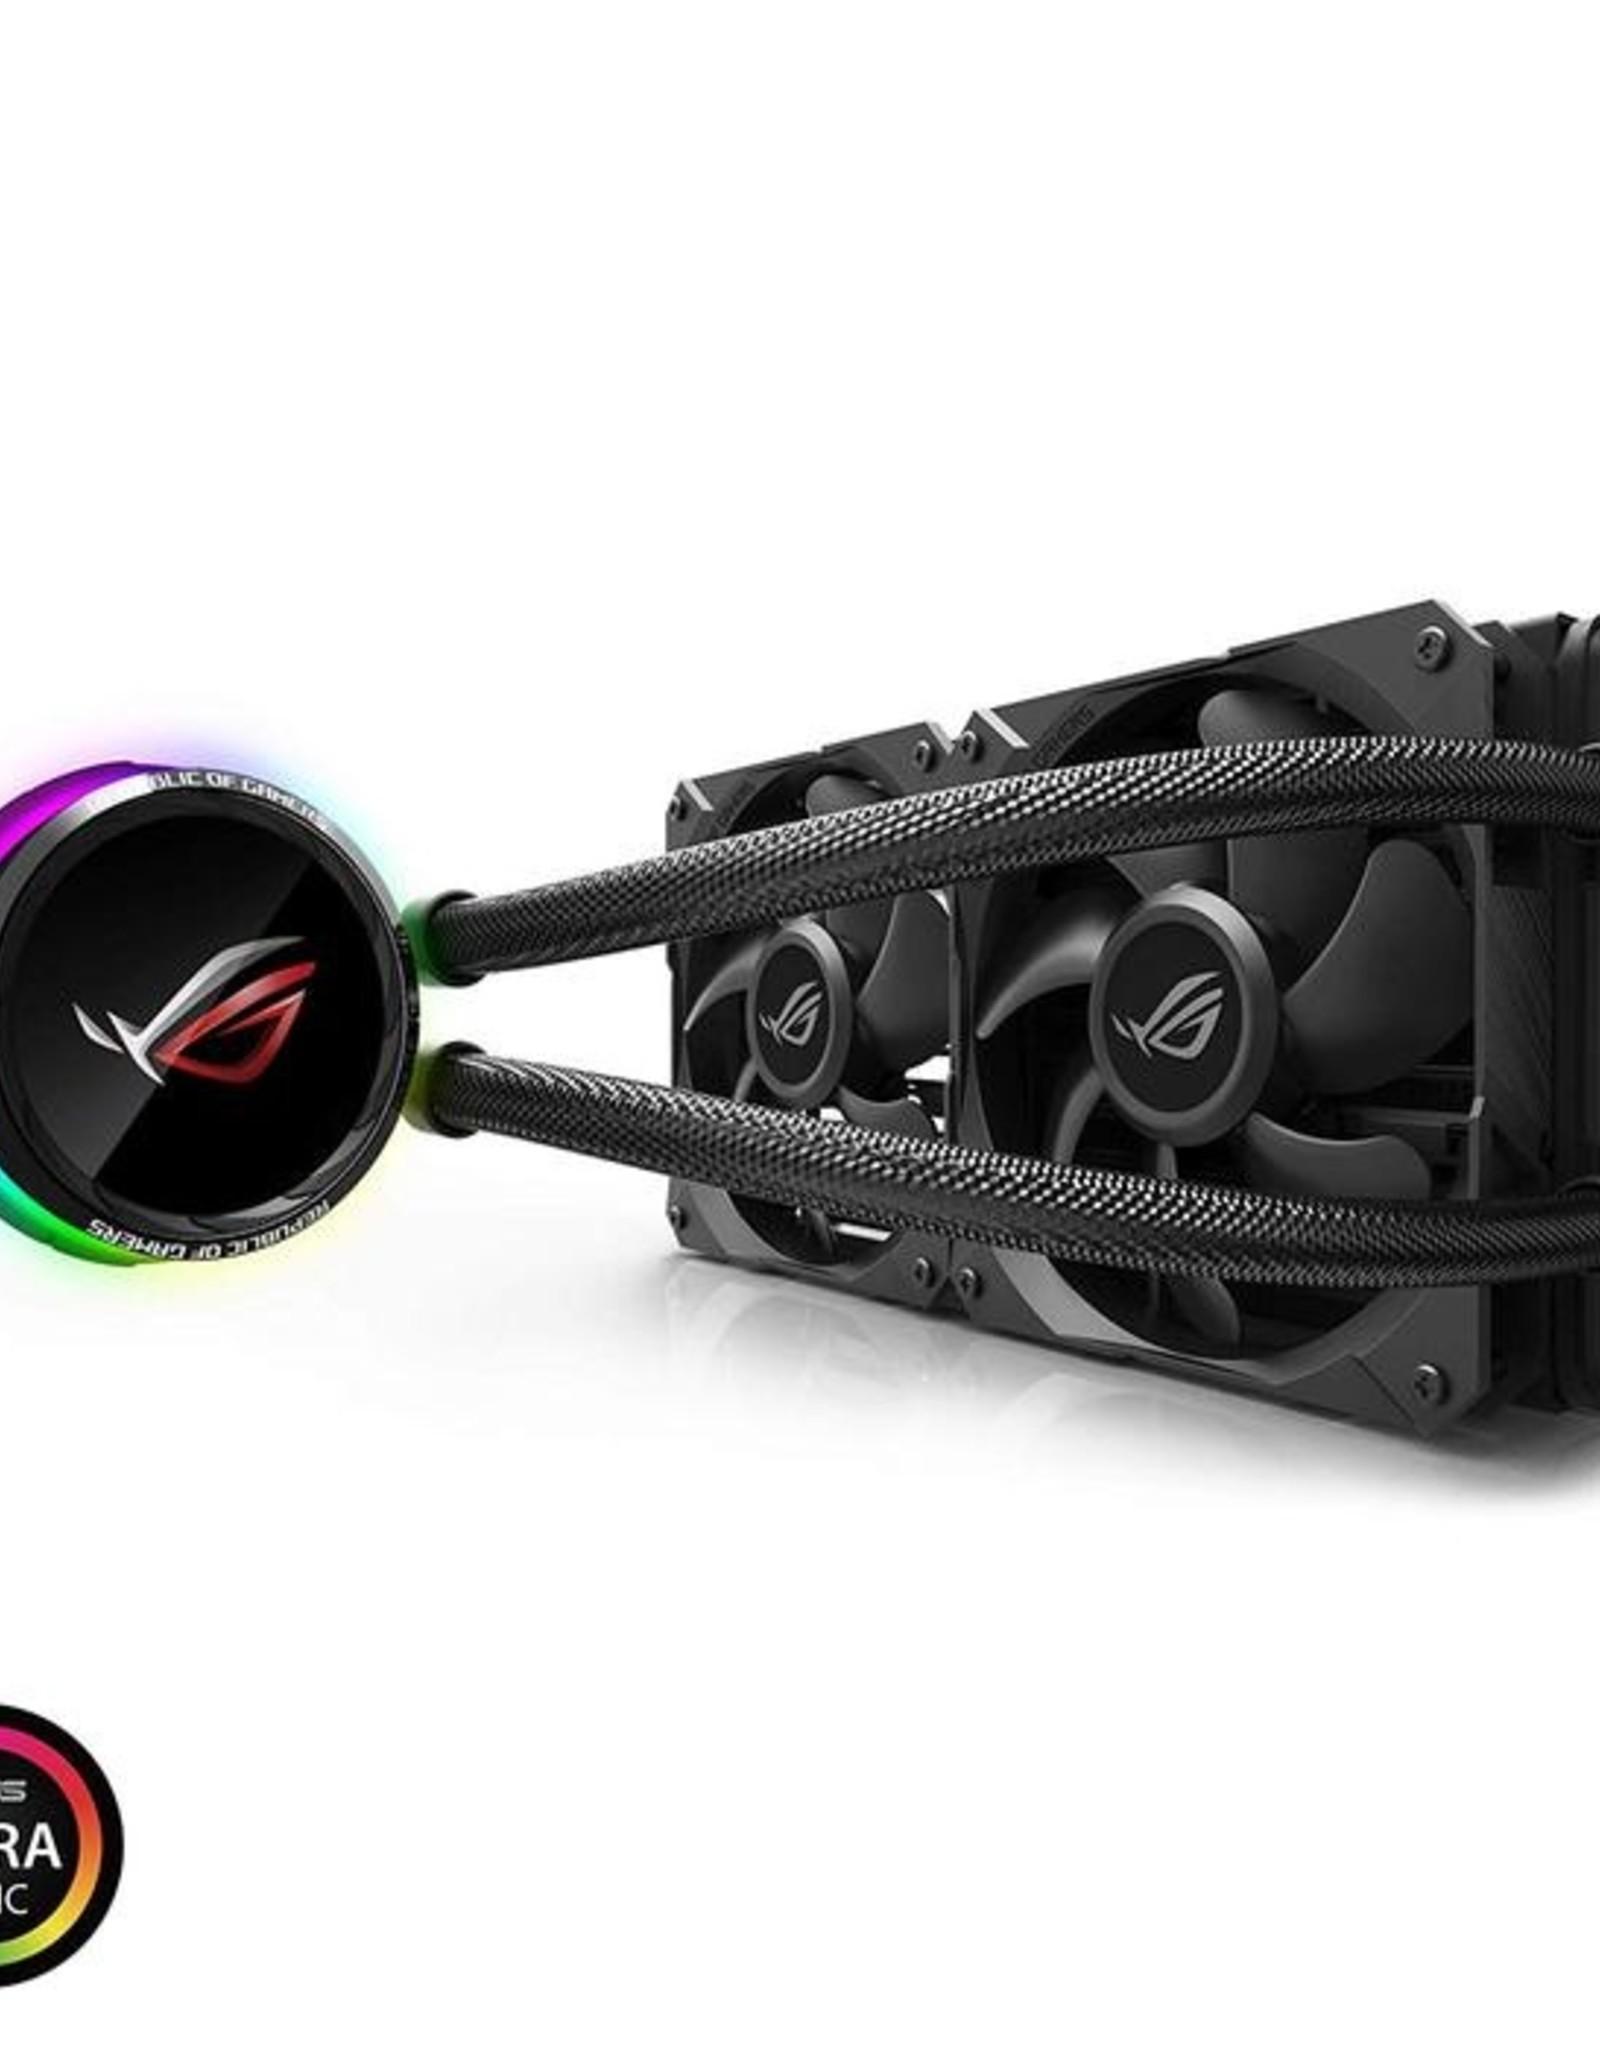 Asus ASUS Fan ROG RYUO 120 AIO liquid CPU cooler color OLED Aura Sync RGB 120mm Fan Retail 221658